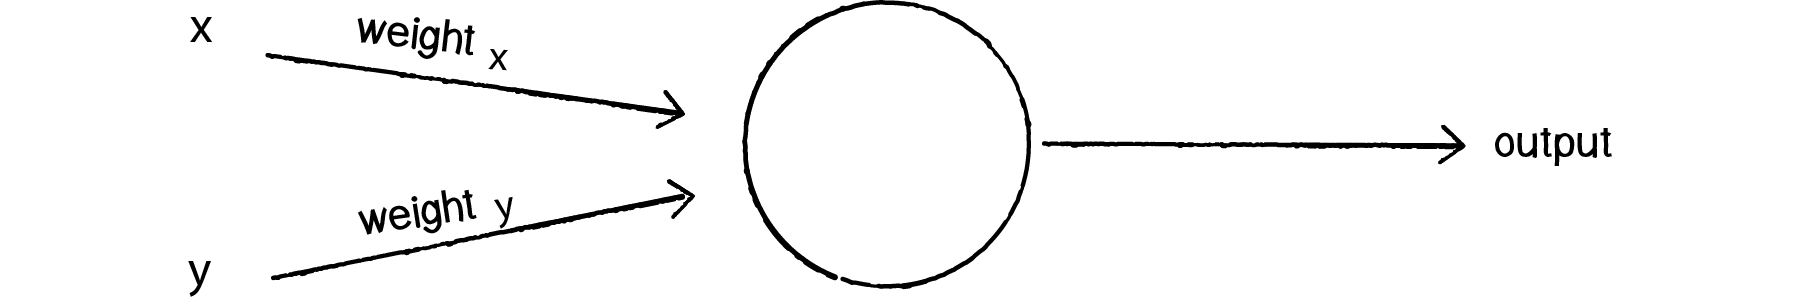 The Perceptron Weights - Source: natureofcode.com